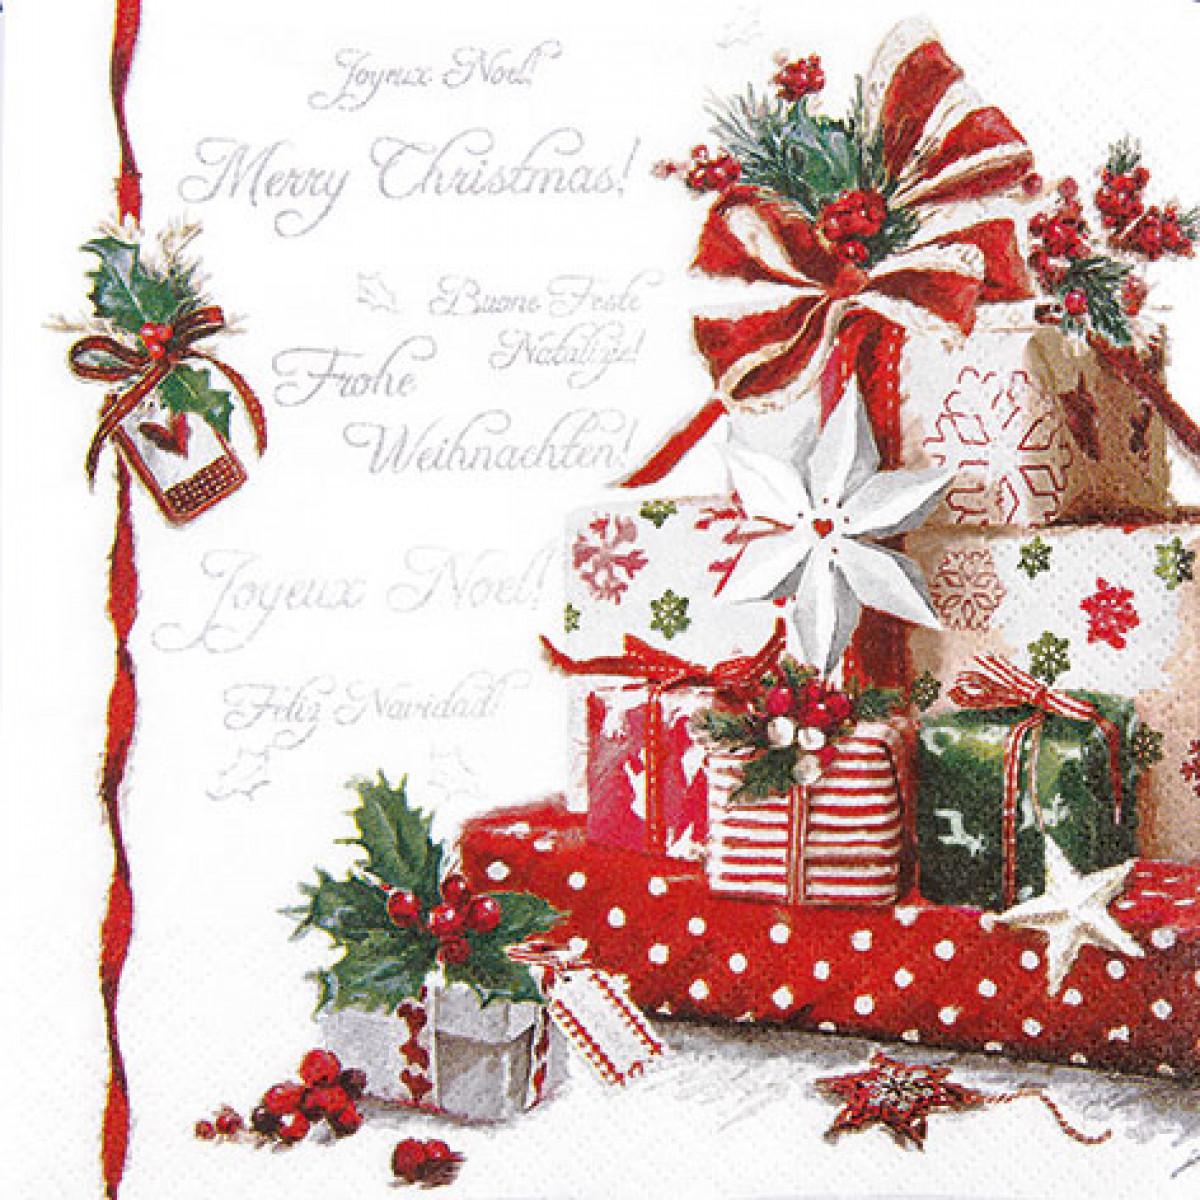 tischservietten weihnachtsgeschenke erzgebirgskunst drechsel. Black Bedroom Furniture Sets. Home Design Ideas